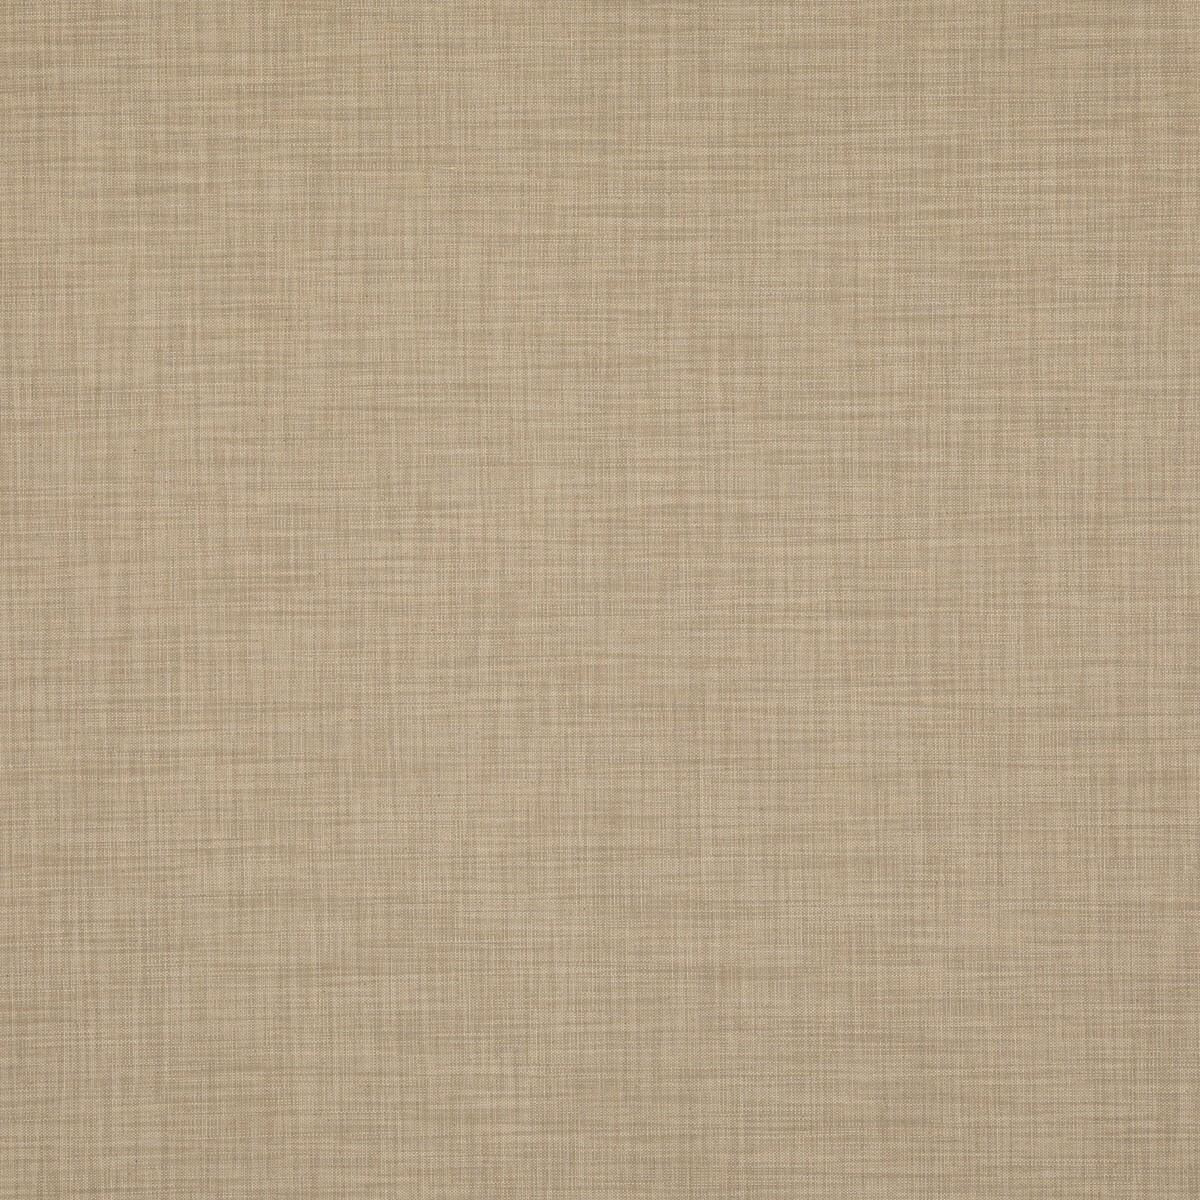 Threads Kalahari Ed85316 110 Fabric Linen